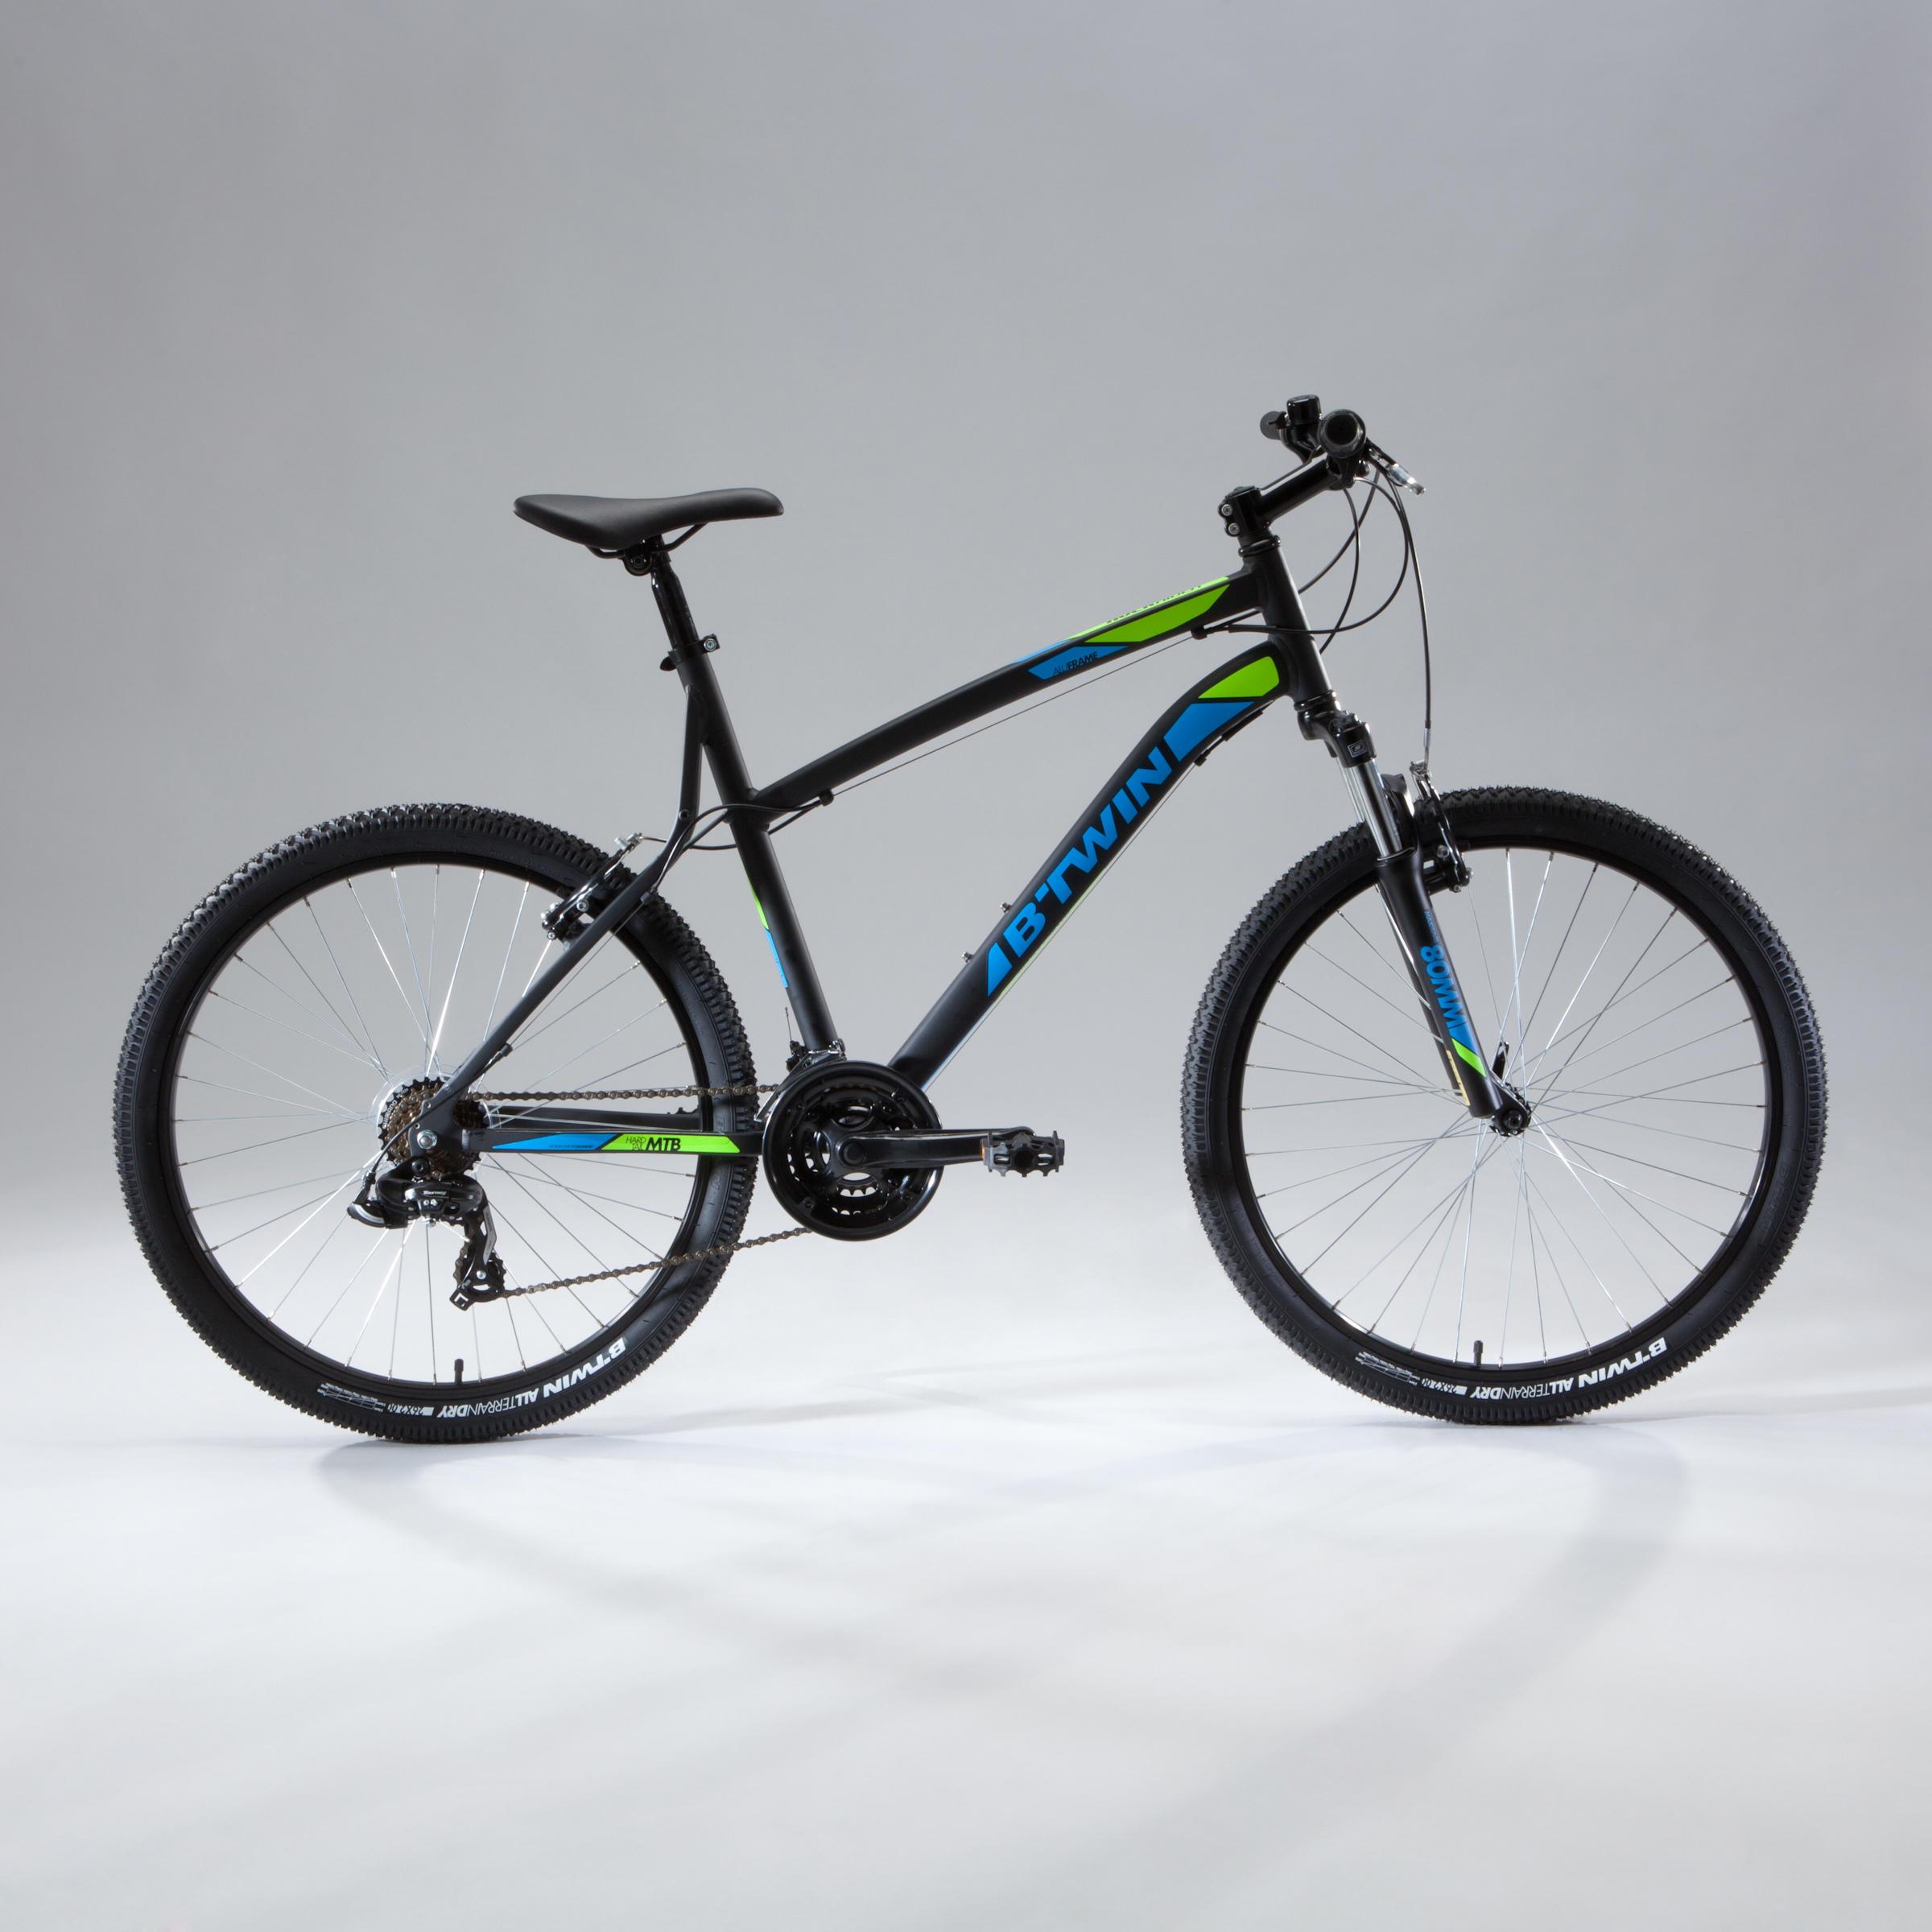 MTB Rockrider 340 26_QUOTE_ - Black